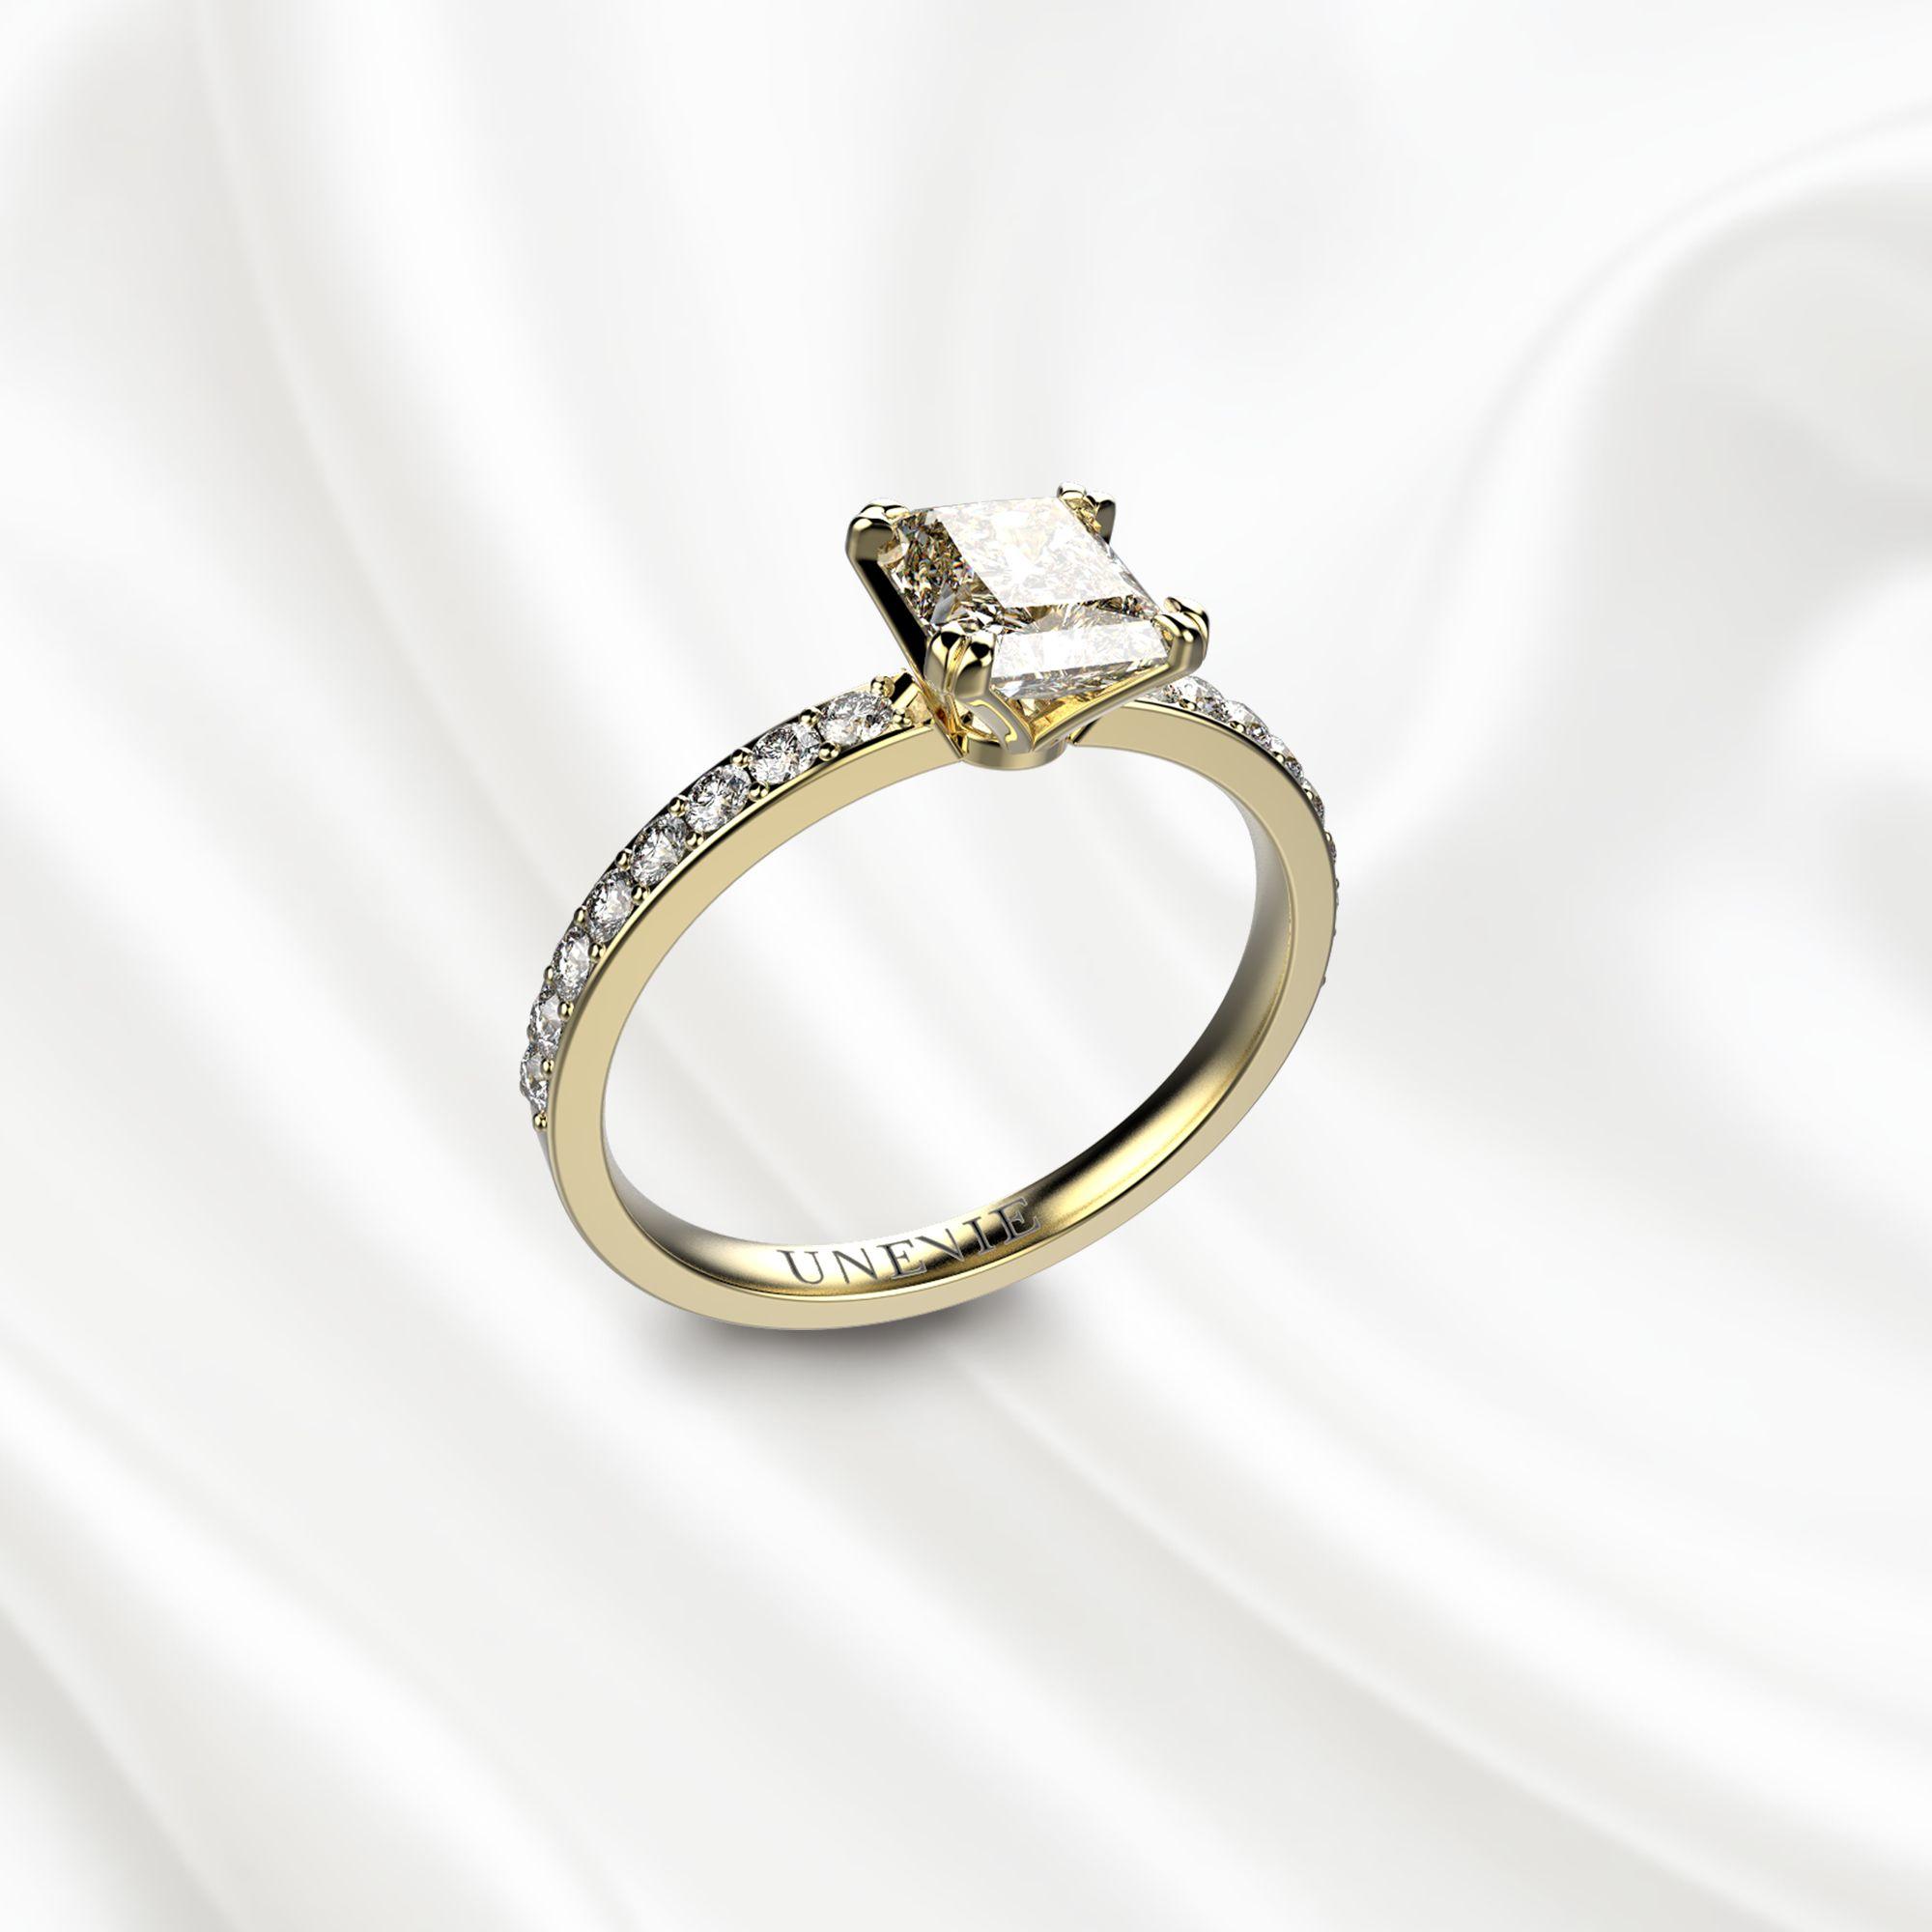 N5 Помолвочное кольцо из розового золота с бриллиантом 1 карат